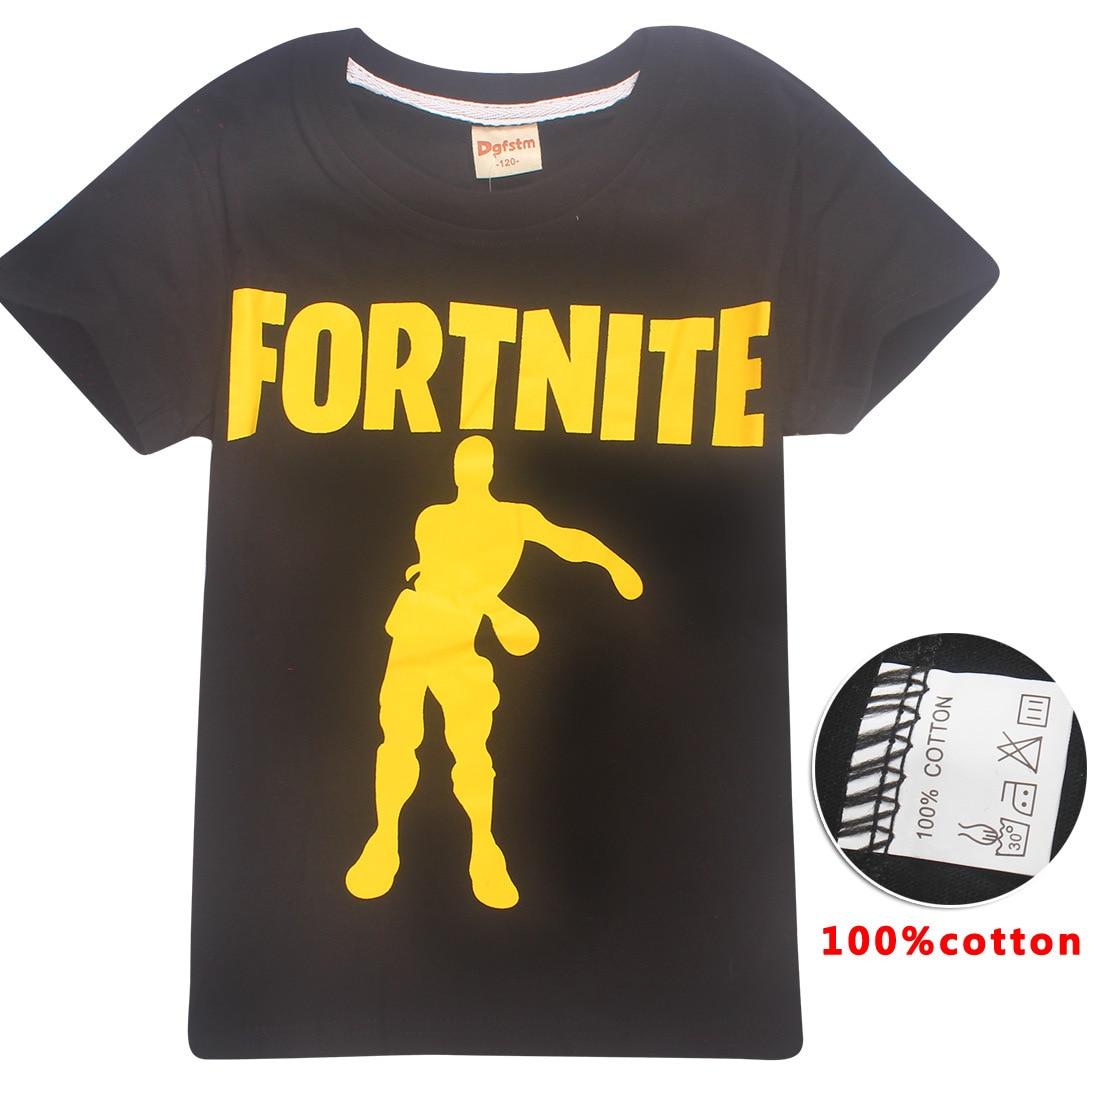 2018 Fortnite T Shirt Kids Boys Tops Short Sleeve Tshirt Girls T-shirts Boys Casual Sports Tees Tops Cartoon Clothes